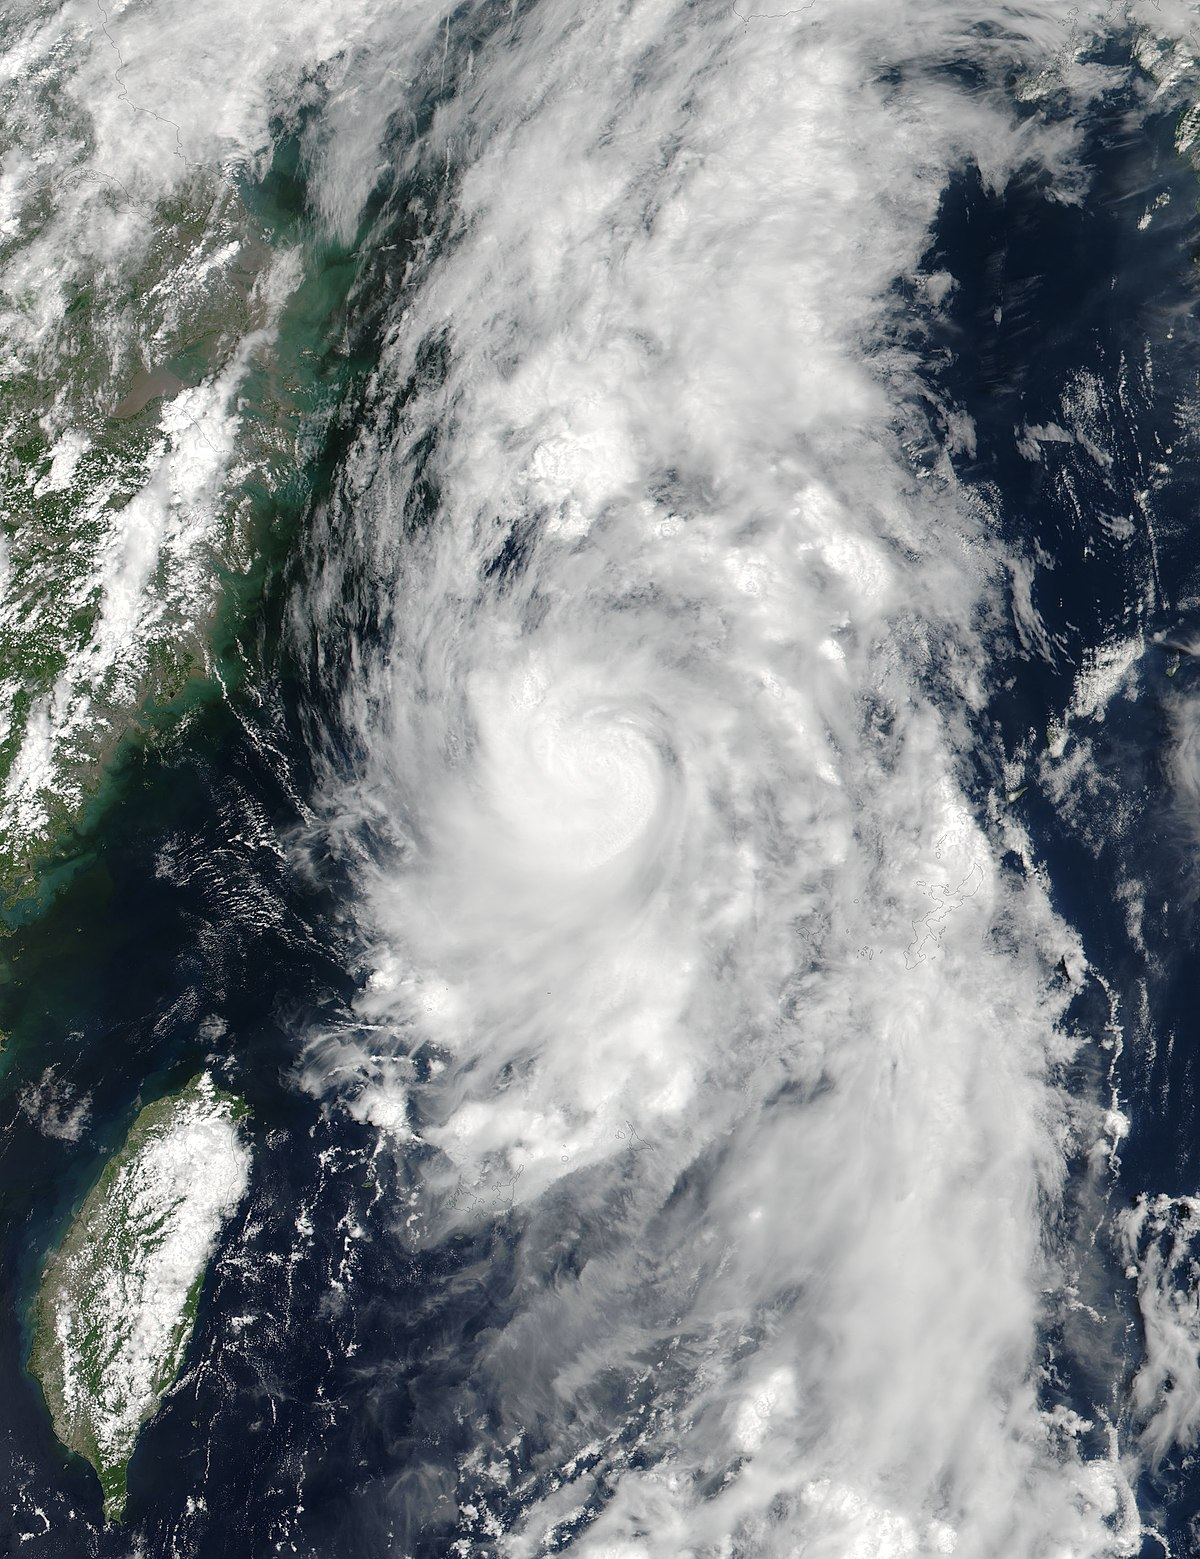 hurricaneの意味・使い方・読み方   Weblio英和辞書